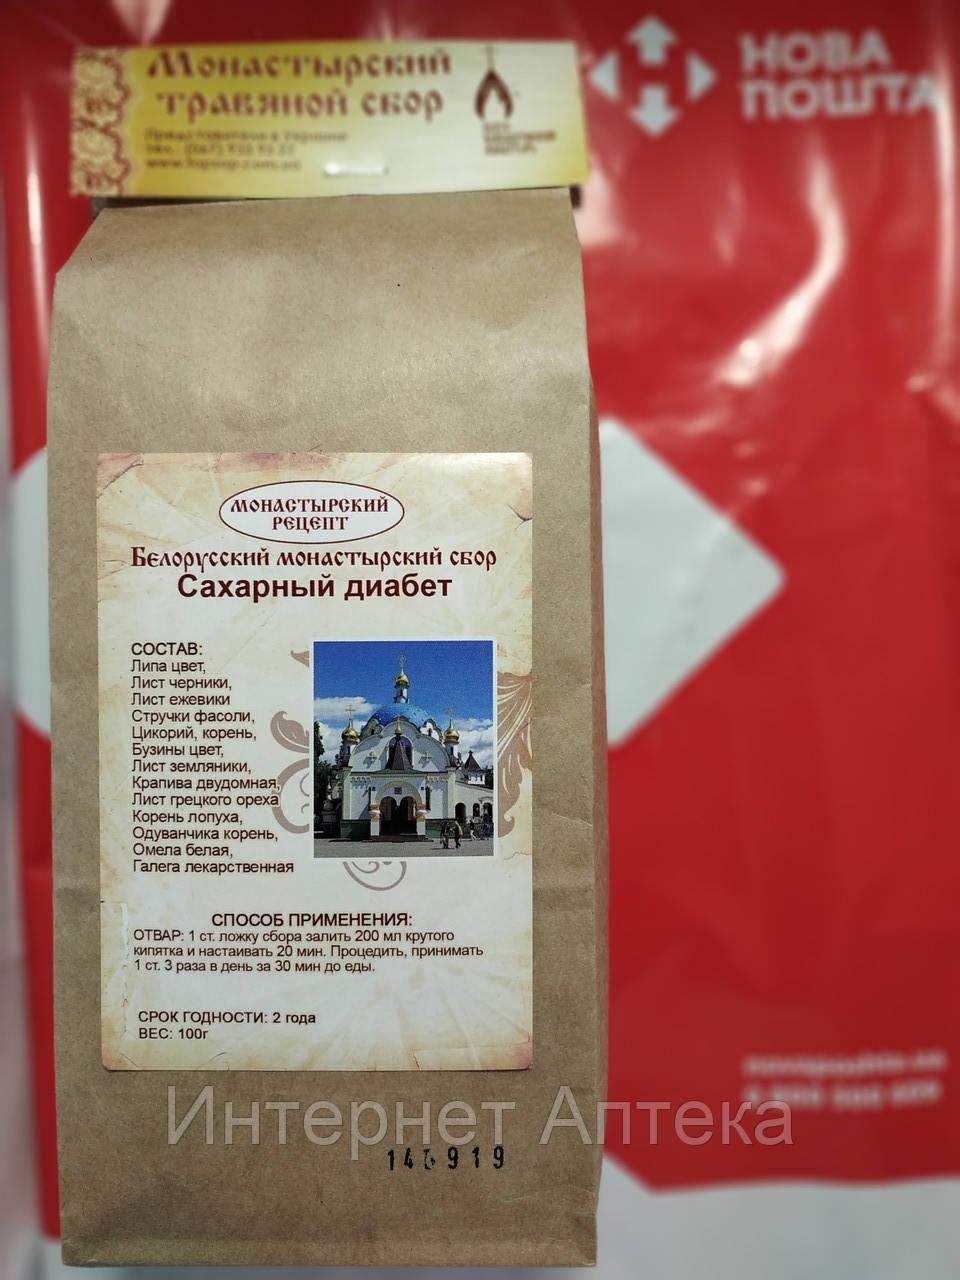 Монастырский чай от диабета, сбор трав против диабета